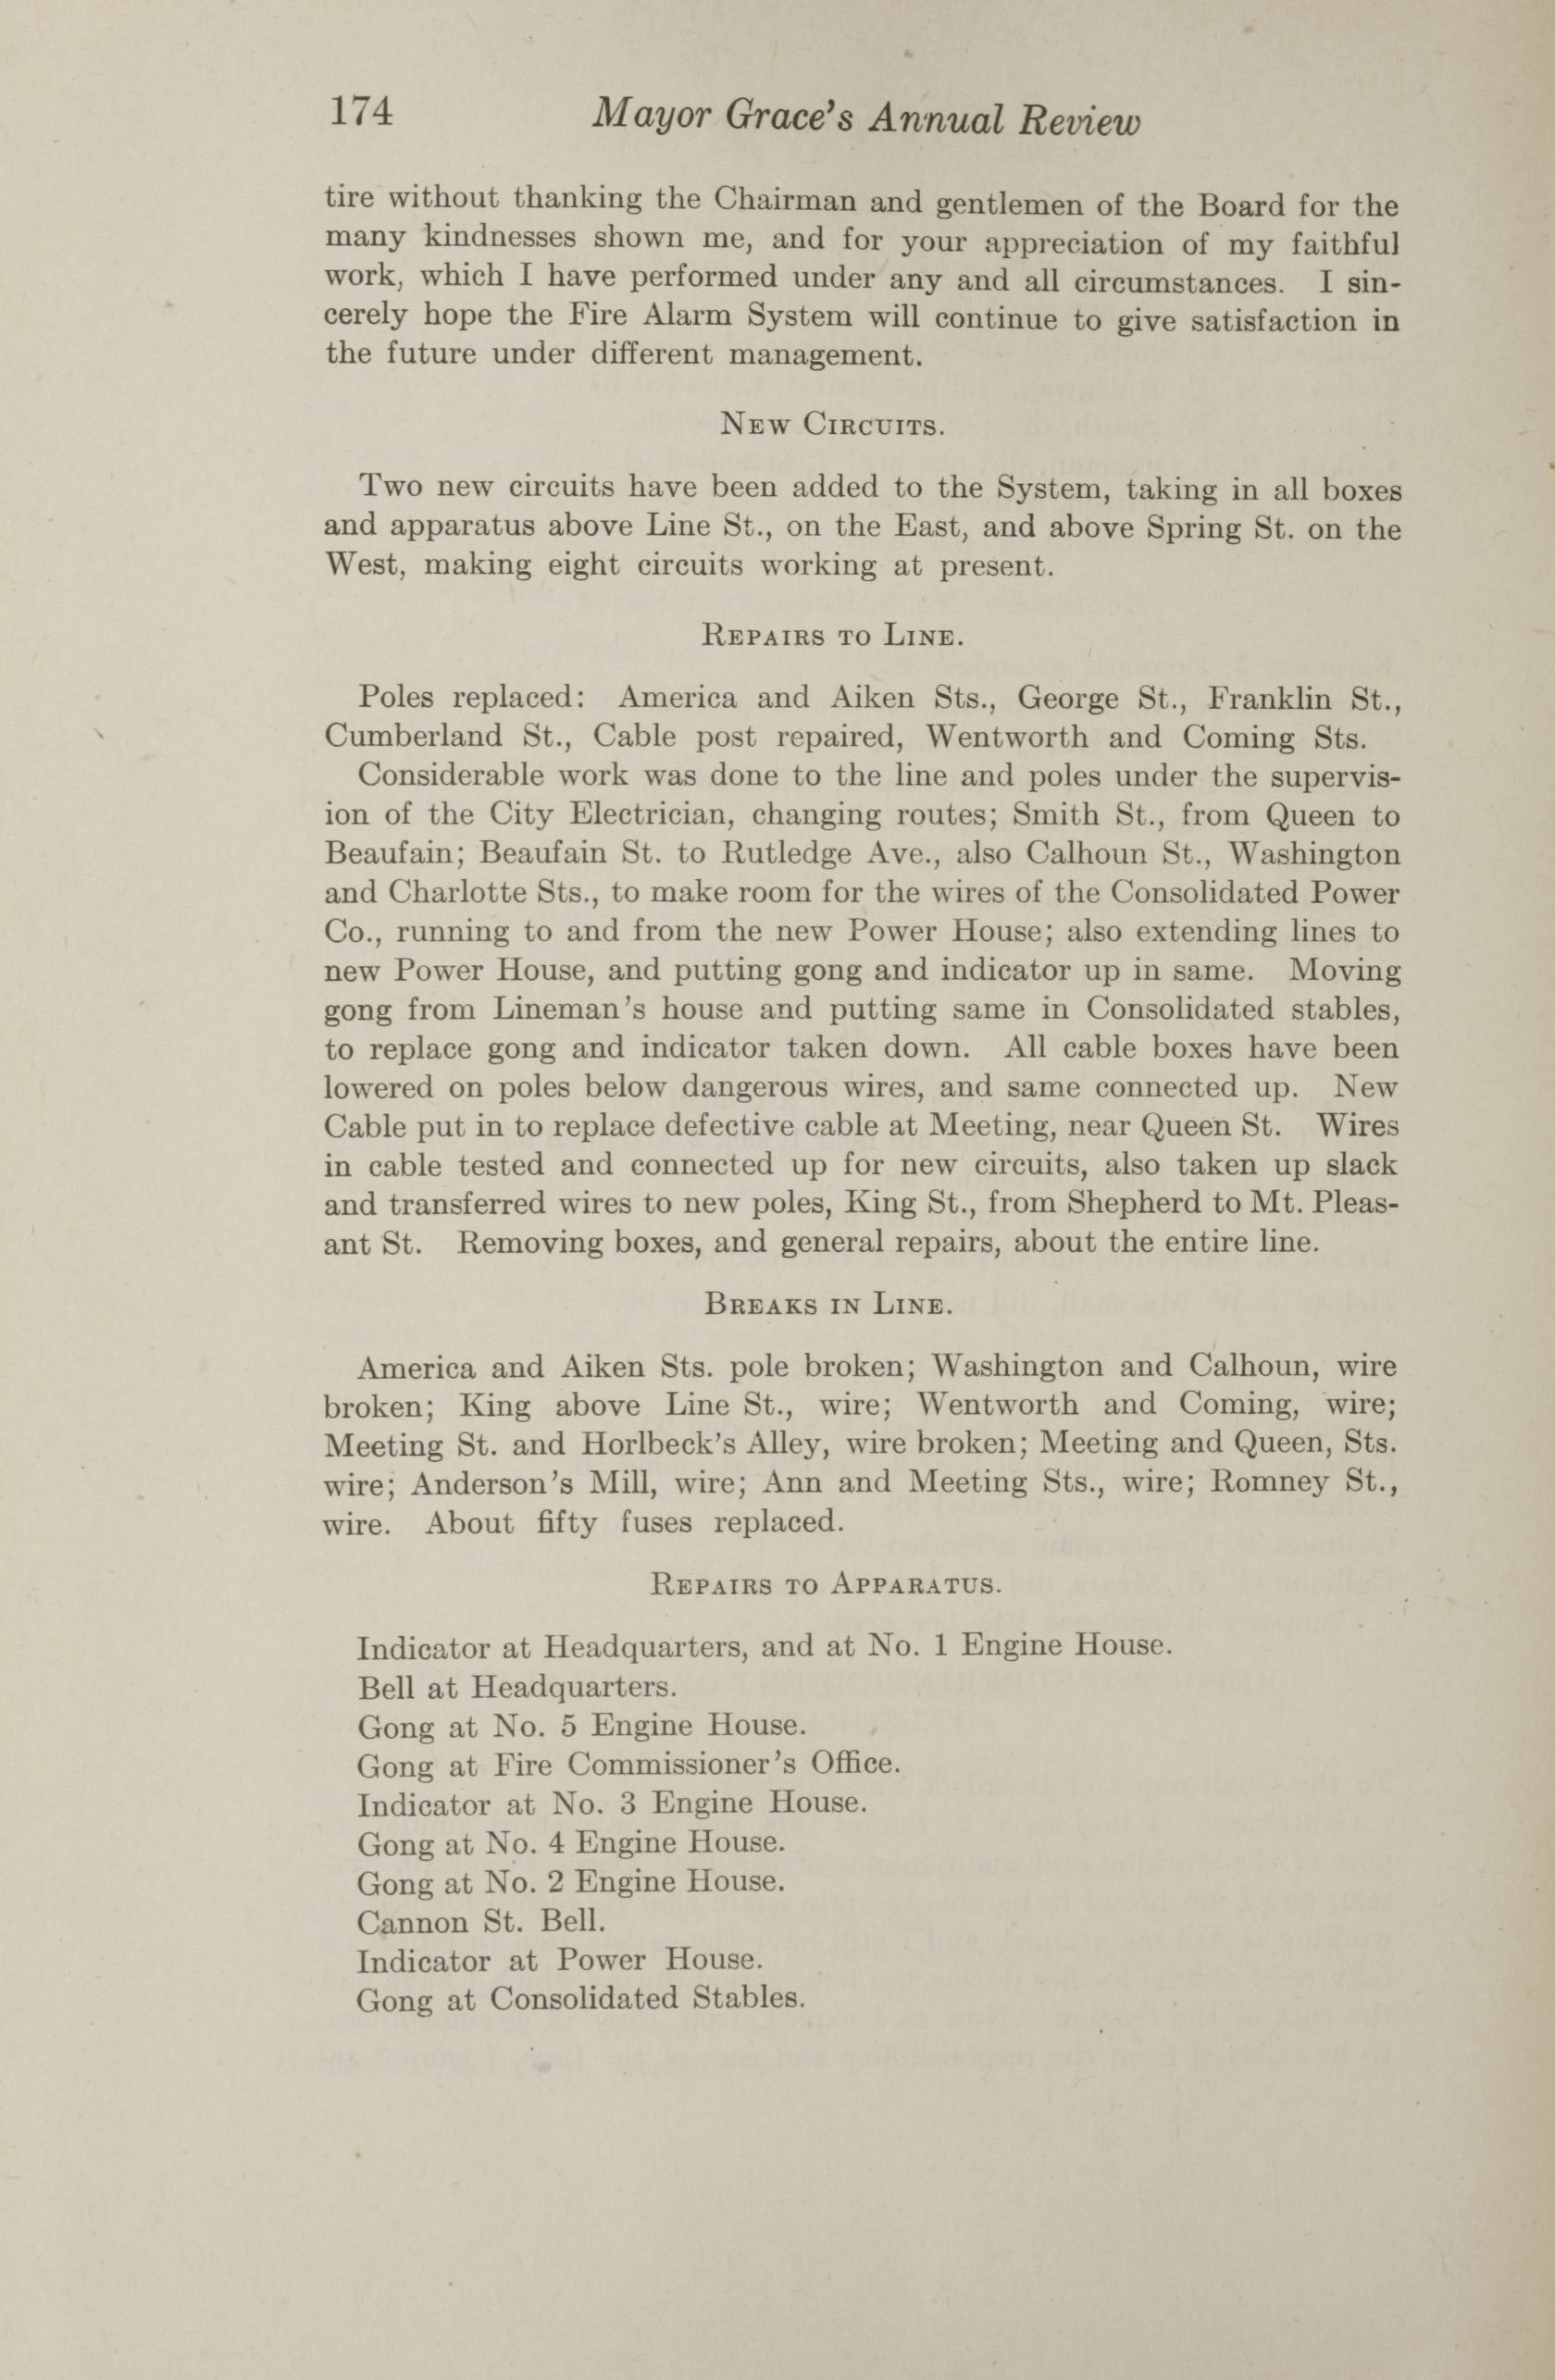 Charleston Yearbook, 1912, page 174